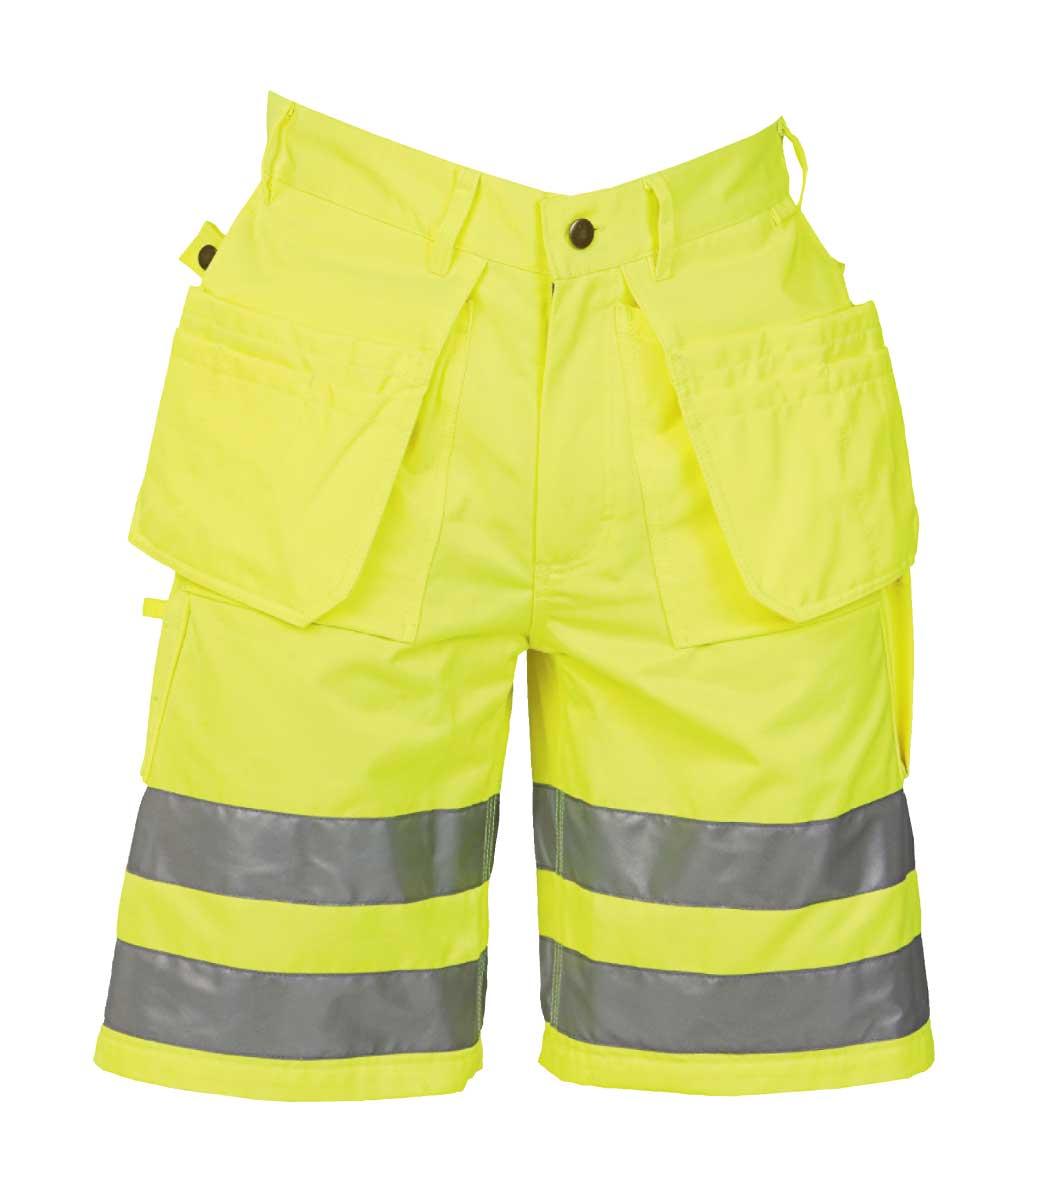 f9ed2b5a Gul shorts - klasse 2 ~ Ezzenza.no Arbeidsklær